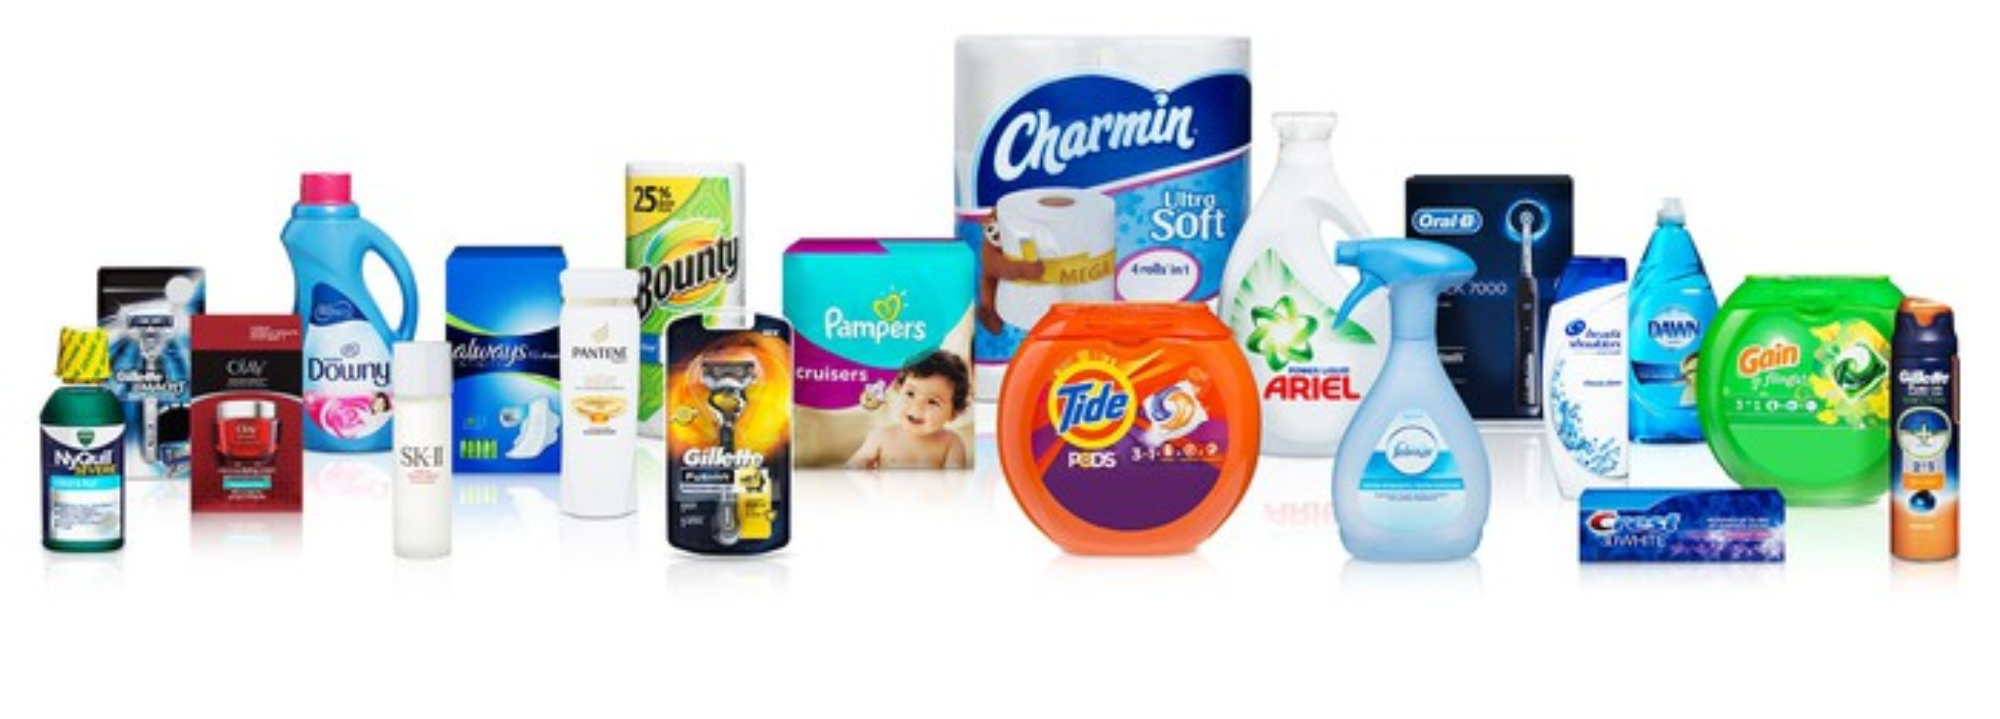 A view of Procter & Gamble's billion-dollar brands.